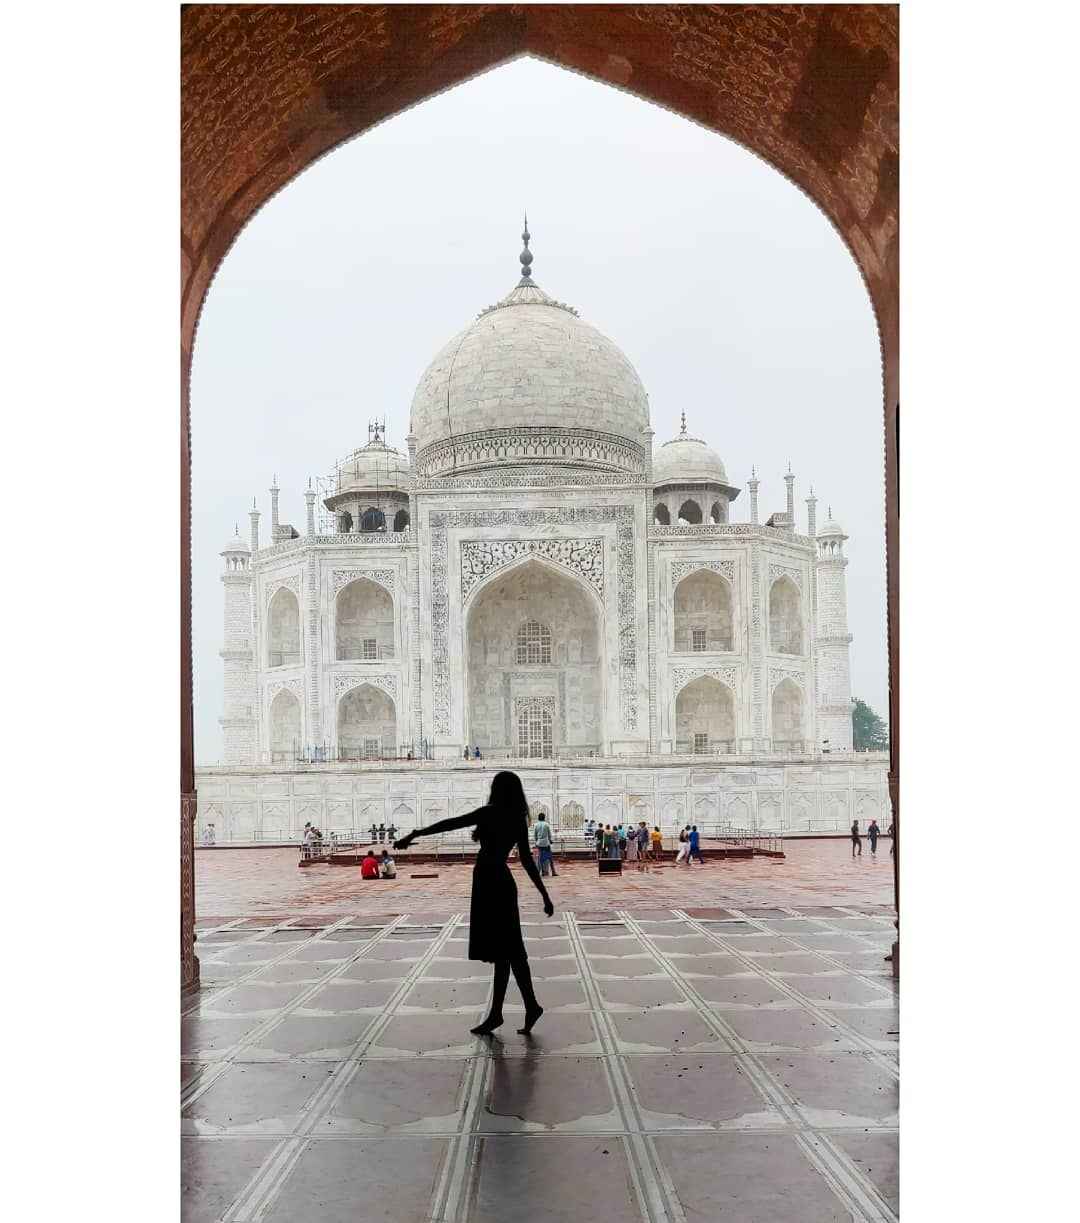 Photo of Taj Mahal By Shruti Mishra